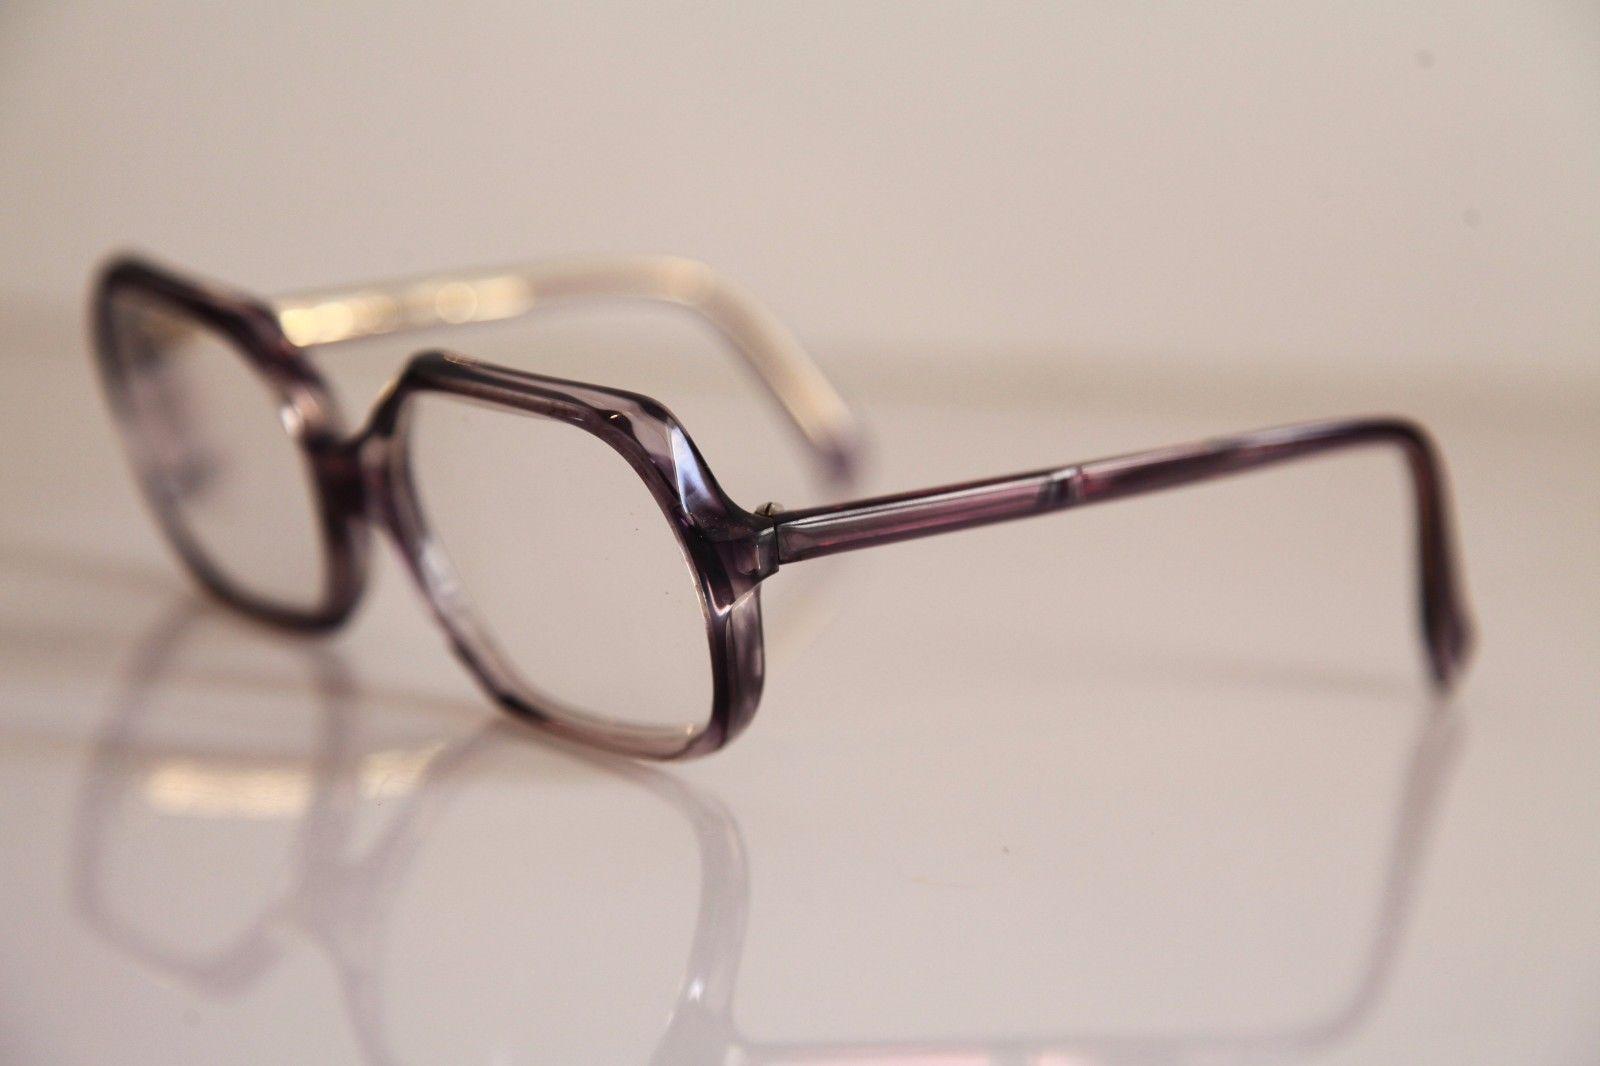 HARGA EVA Eyewear, Crystal Deep Purple Frame, RX-Able Prescription lens. FRANCE image 4